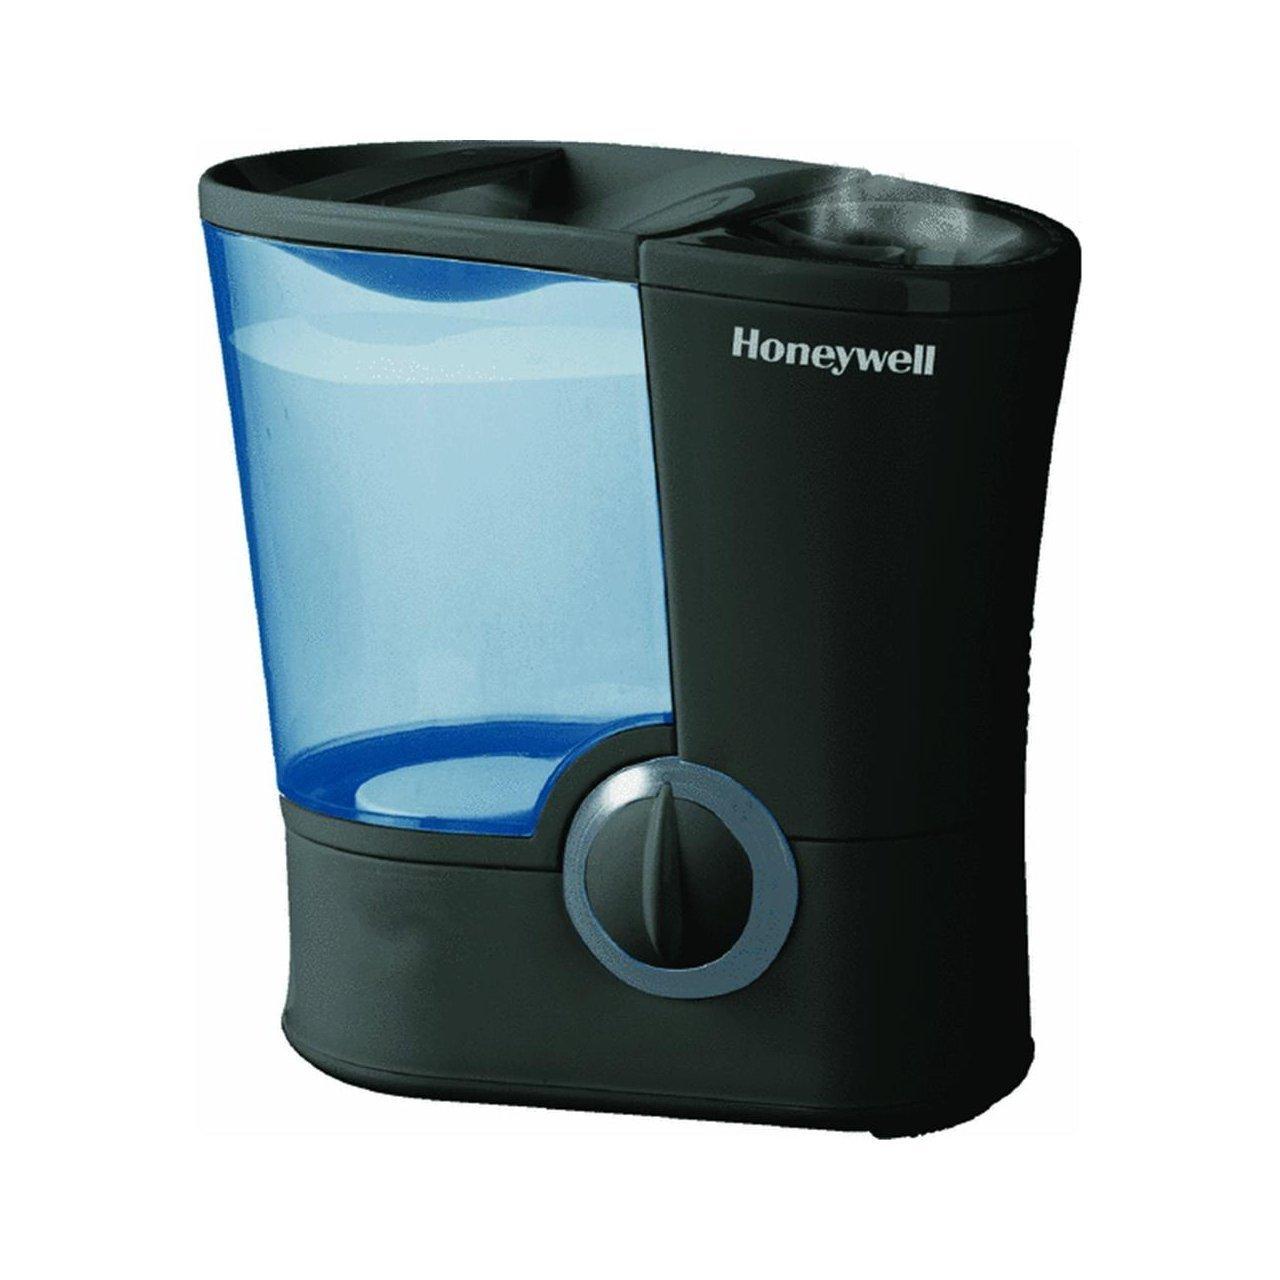 Honeywell steam humidifier Honeywell HWM 950 Filter Free Warm  #154985